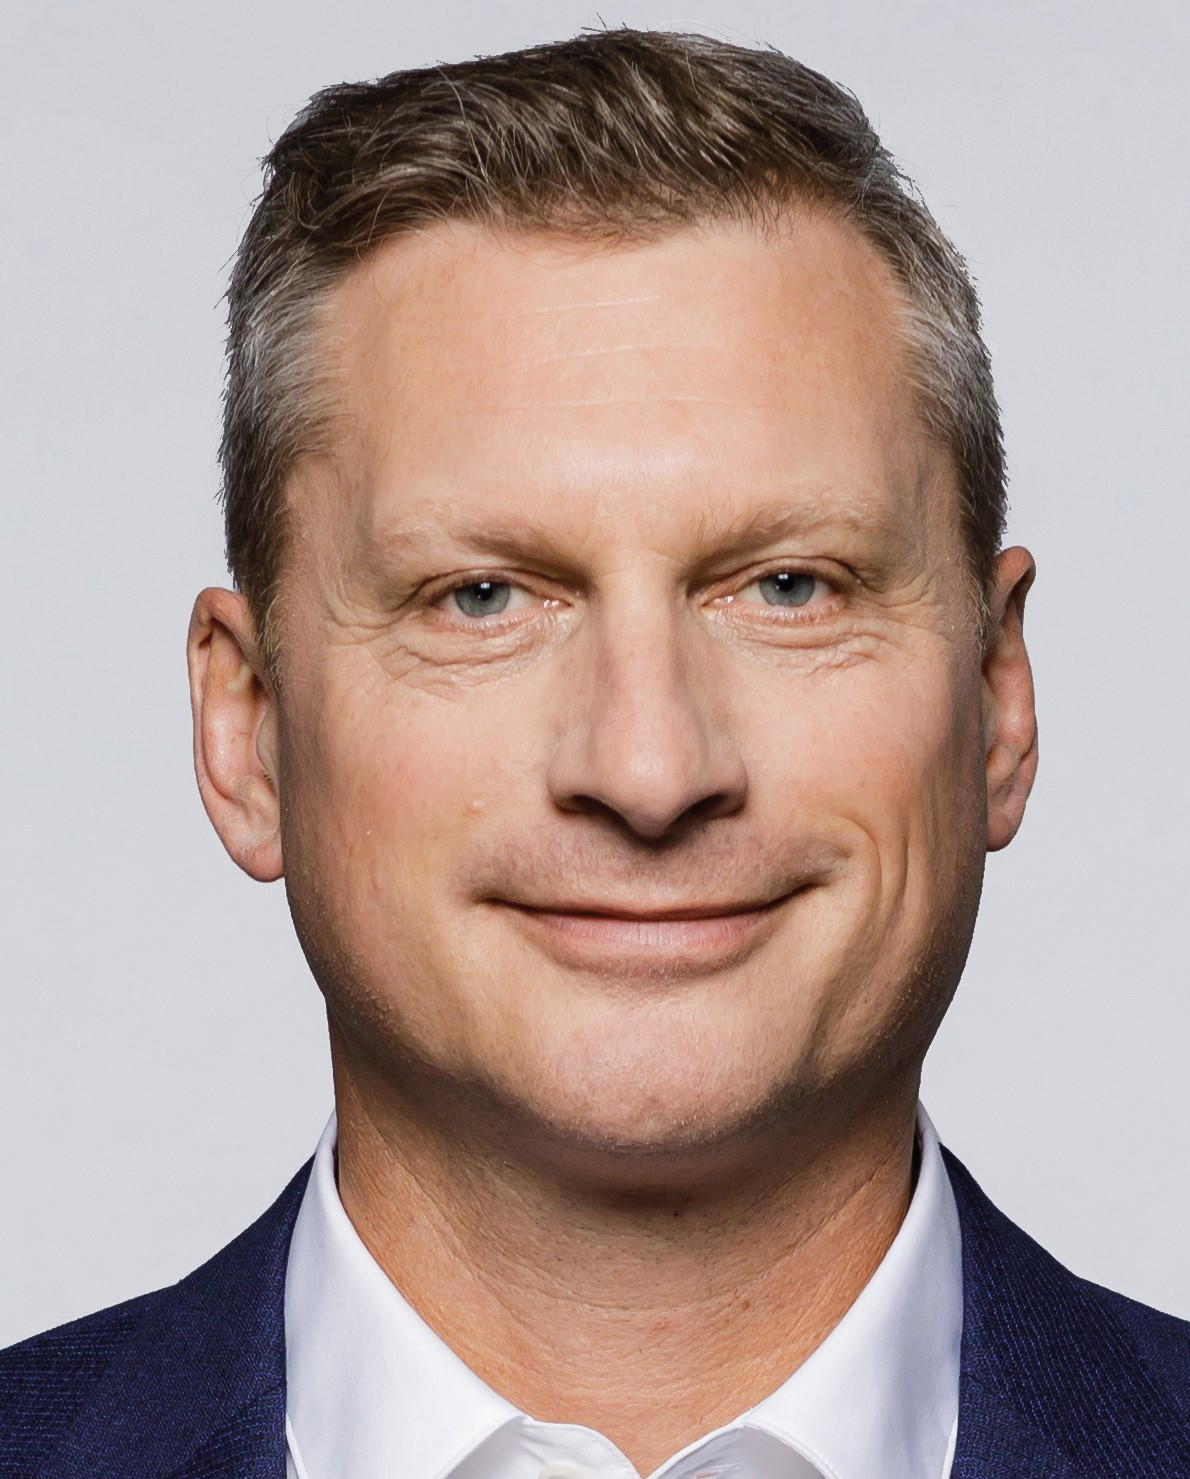 Ulrich Dopfer, Adva Optical Networking SE